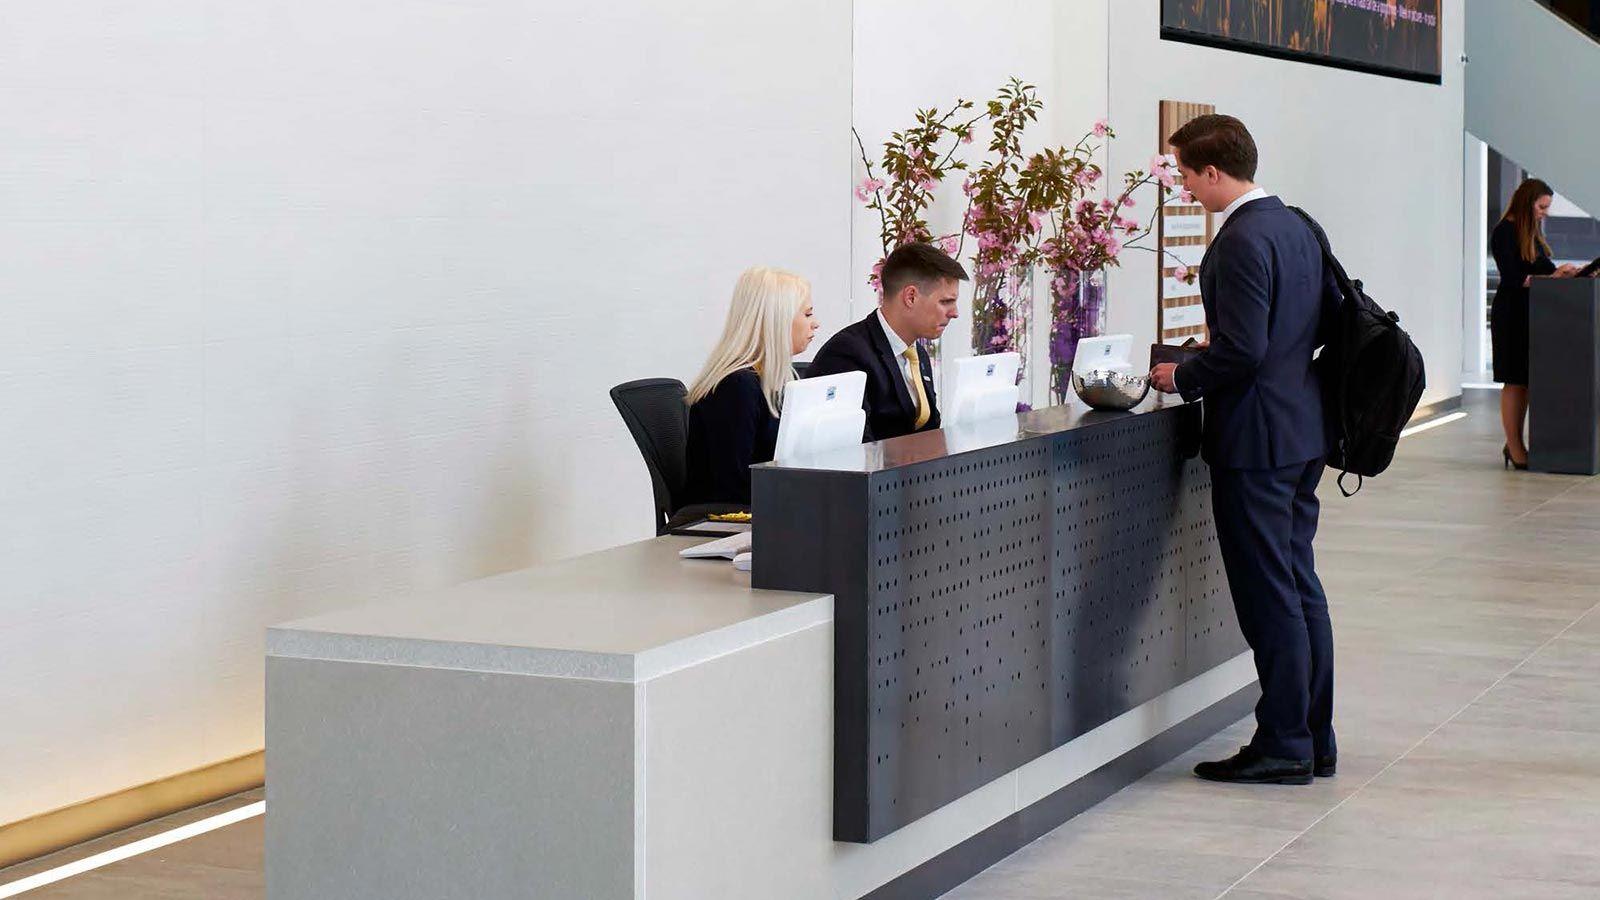 Aviva Building - Reception Desk - Mace Group